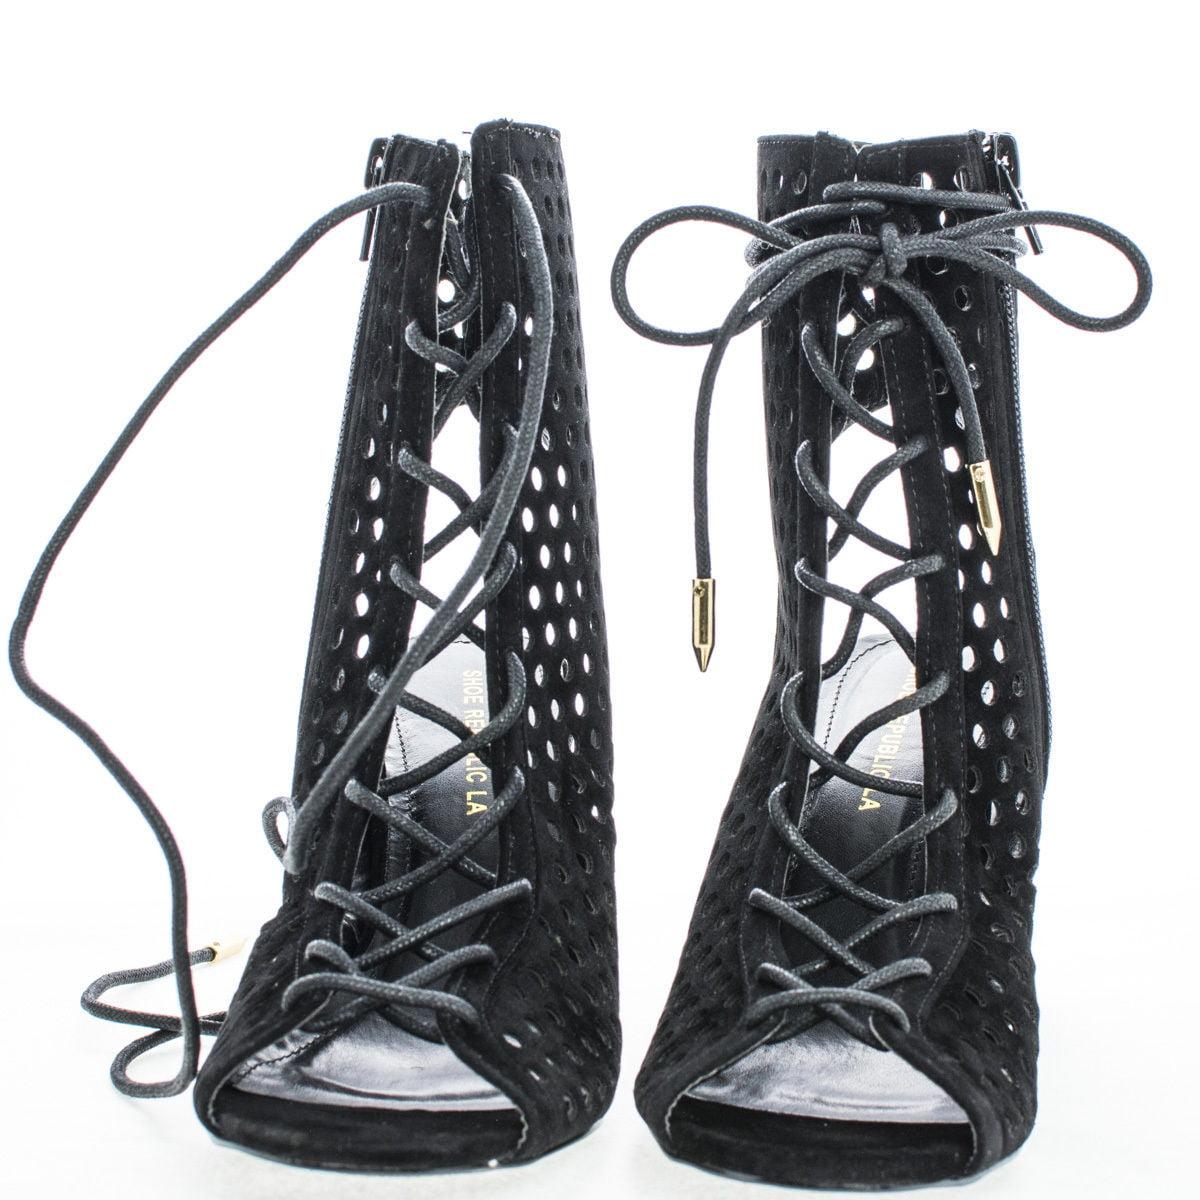 fb35a03f1b0a Shoe Republic - Sundaze by Shoe Republic